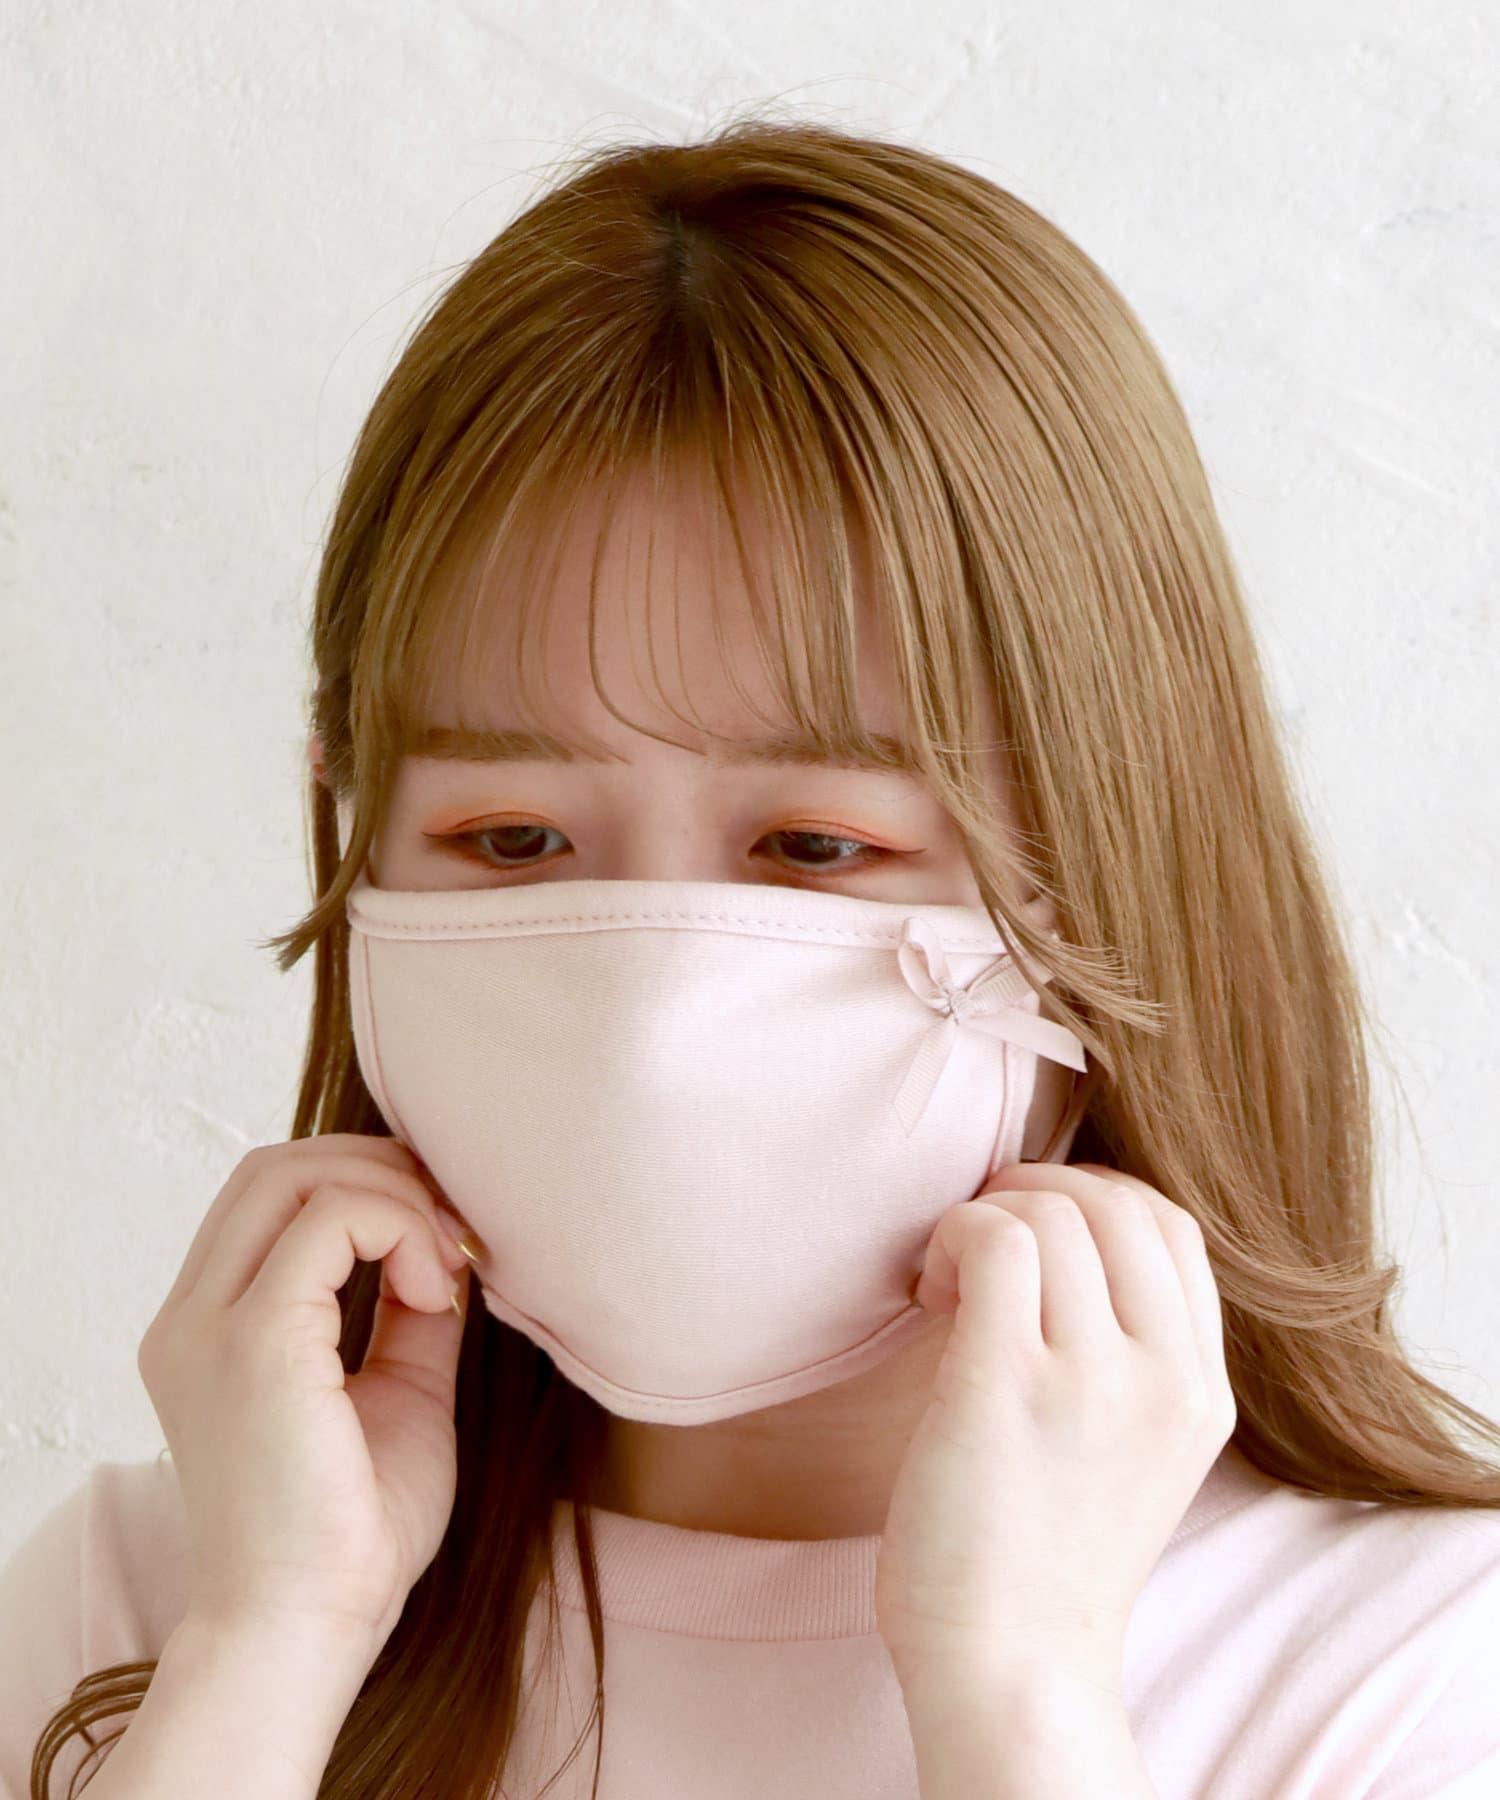 3COINS(スリーコインズ) 【就寝時の集中肌ケア】保湿用リップマスク